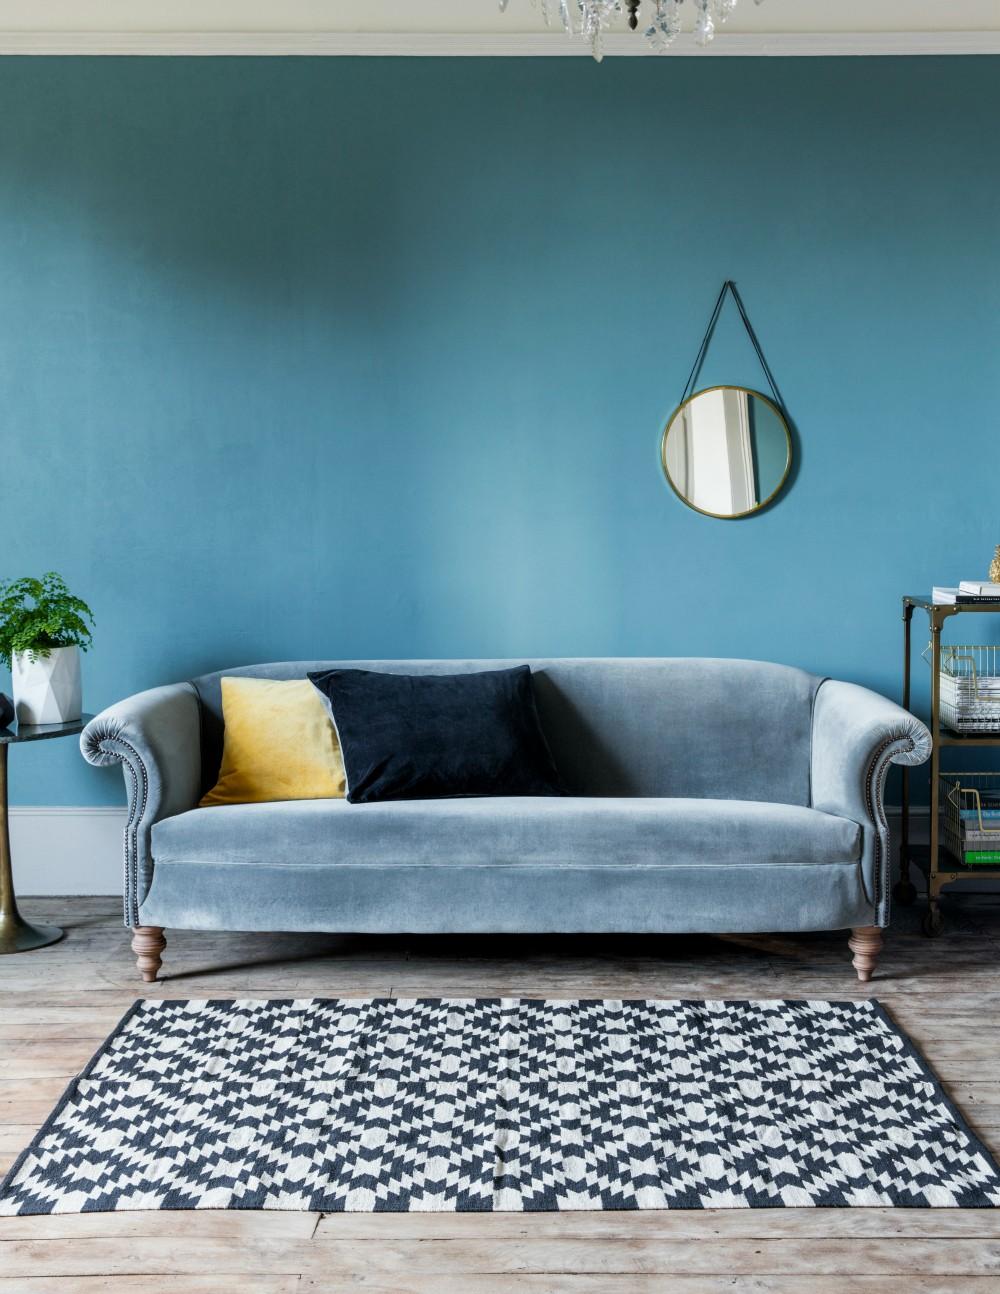 Velvet Sofas 7 Of The Latest Looks The English Home